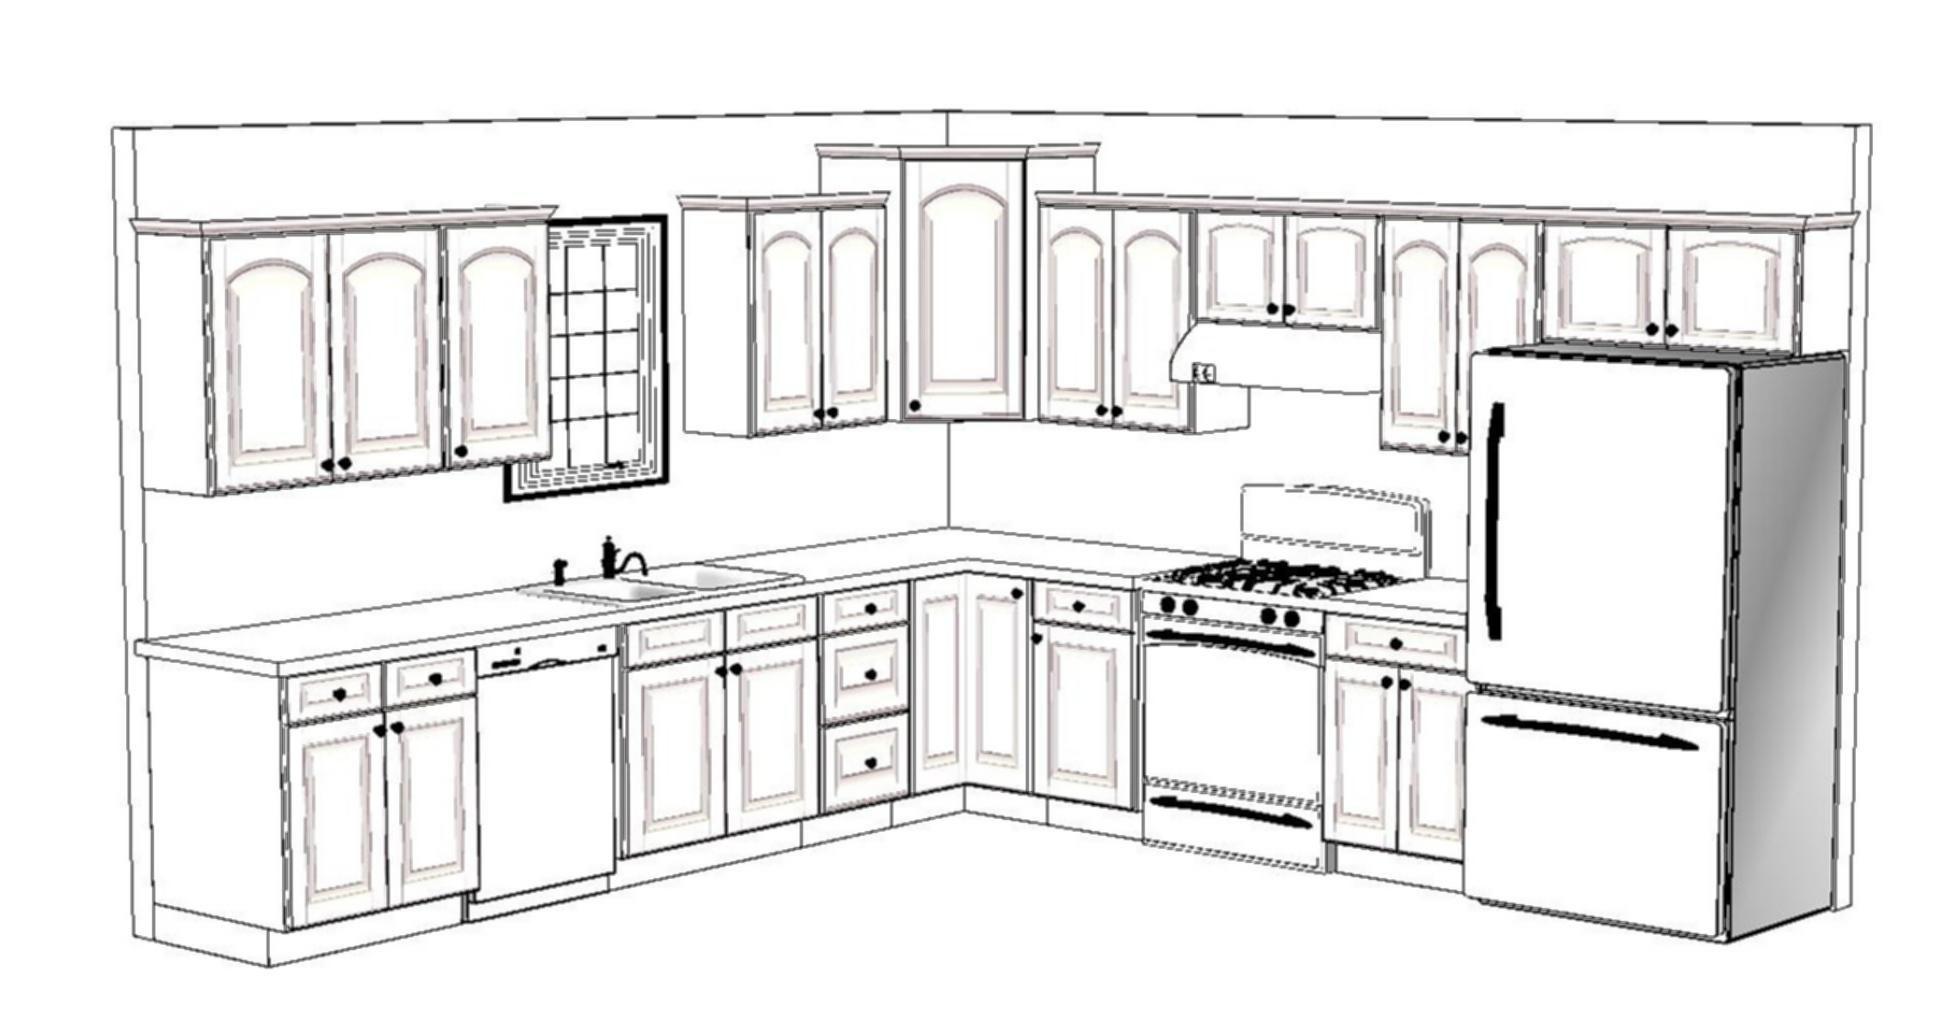 X Kitchen Floor Plan Layout Ki On L Shaped Kitchen Design Ideas To Inspire You 8 X 8 Kitchen Floor Best Kitchen Layout Kitchen Layout Plans Kitchen Floor Plans